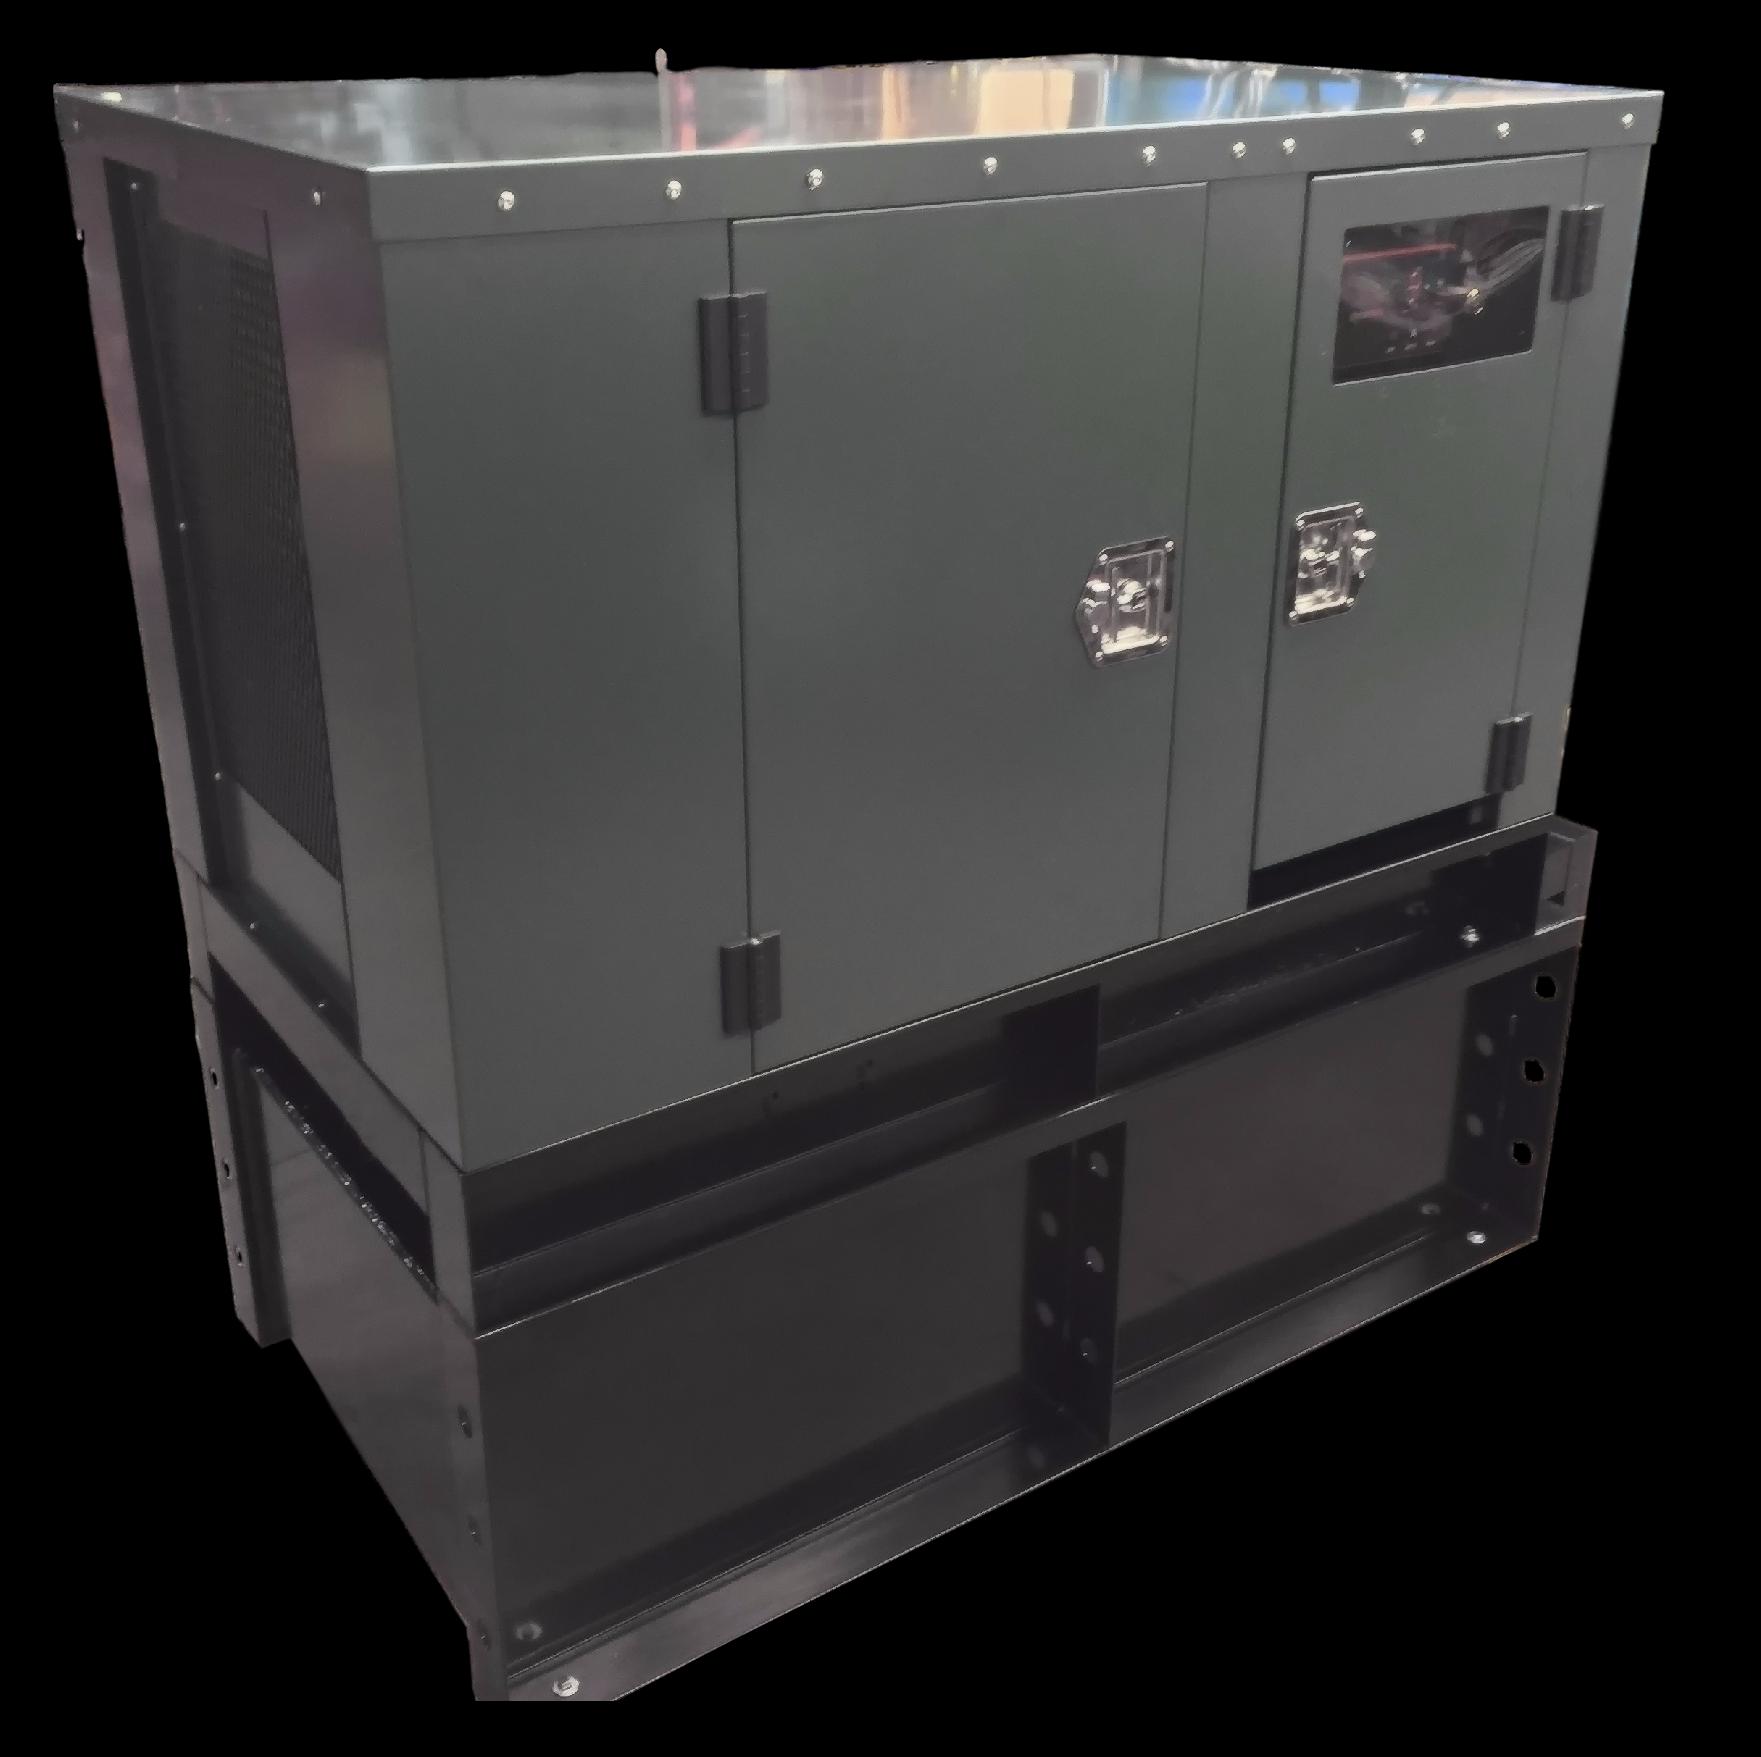 100 Gallon Generator Fuel Tank Portable Diesel Generator Gas Powered Generator Generators For Sale